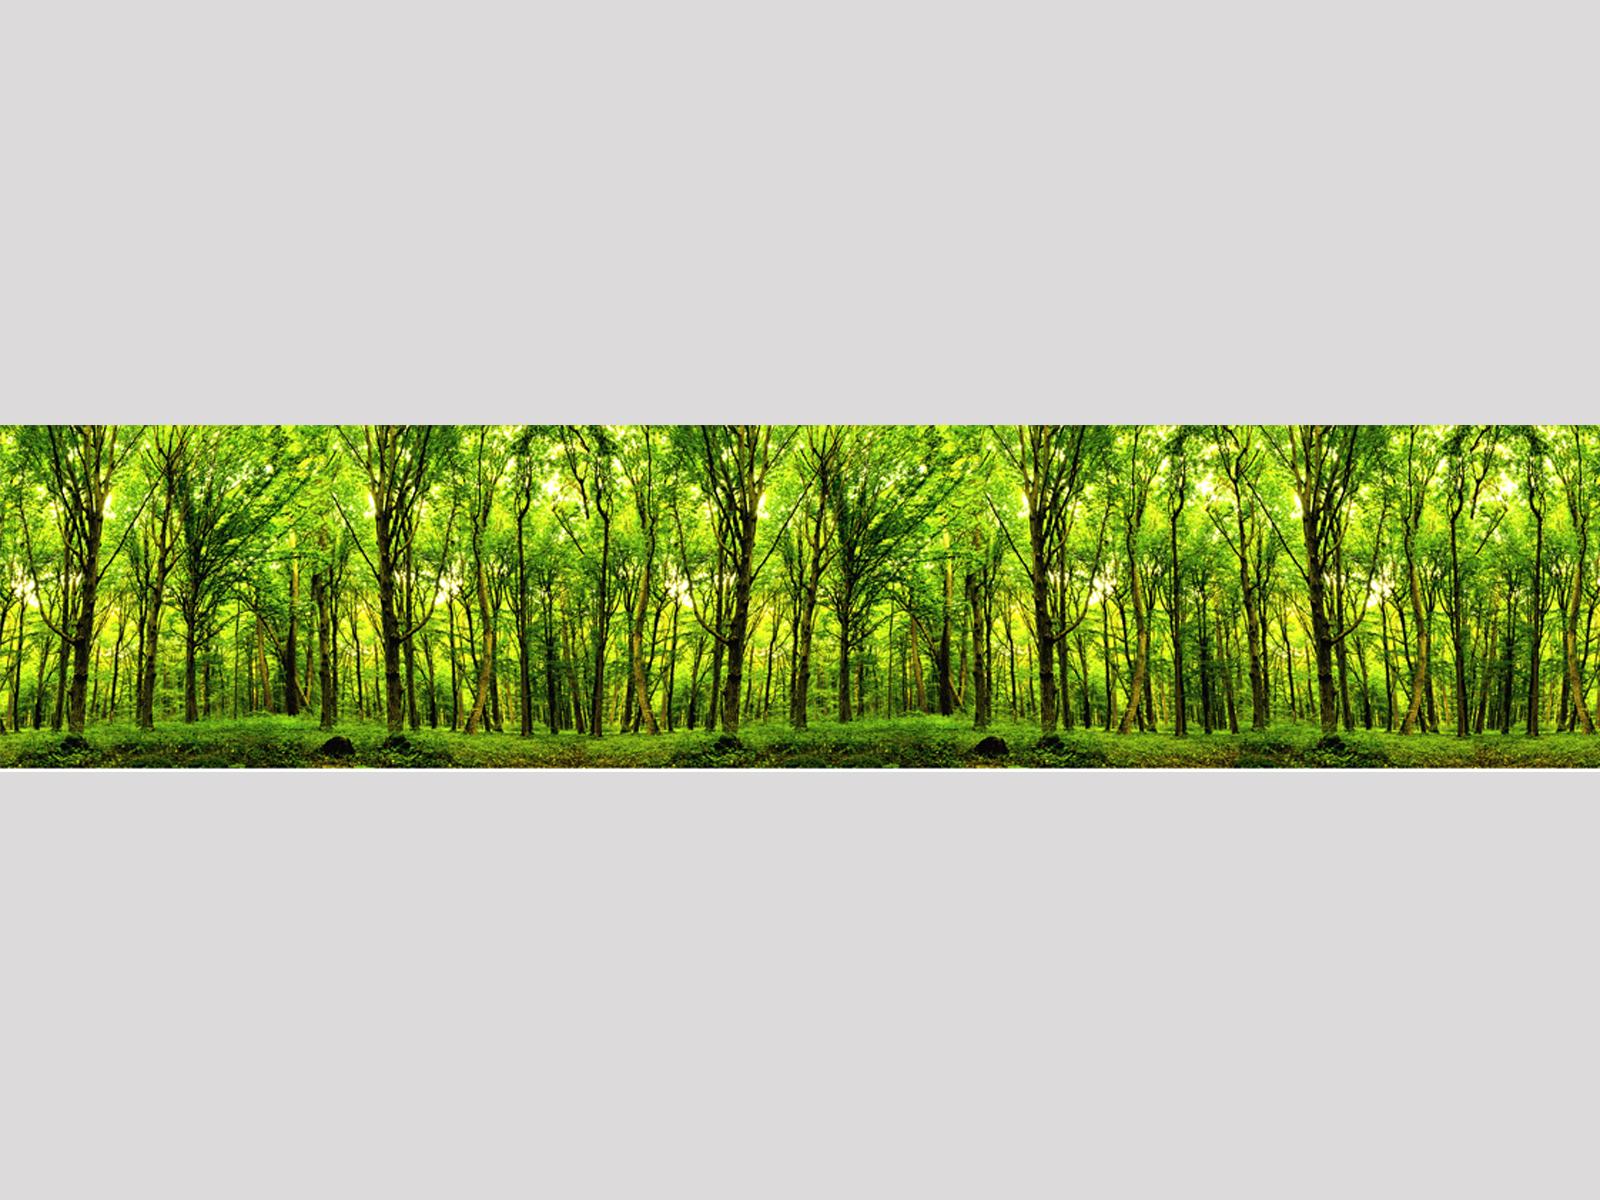 Motiv Grüner Wald